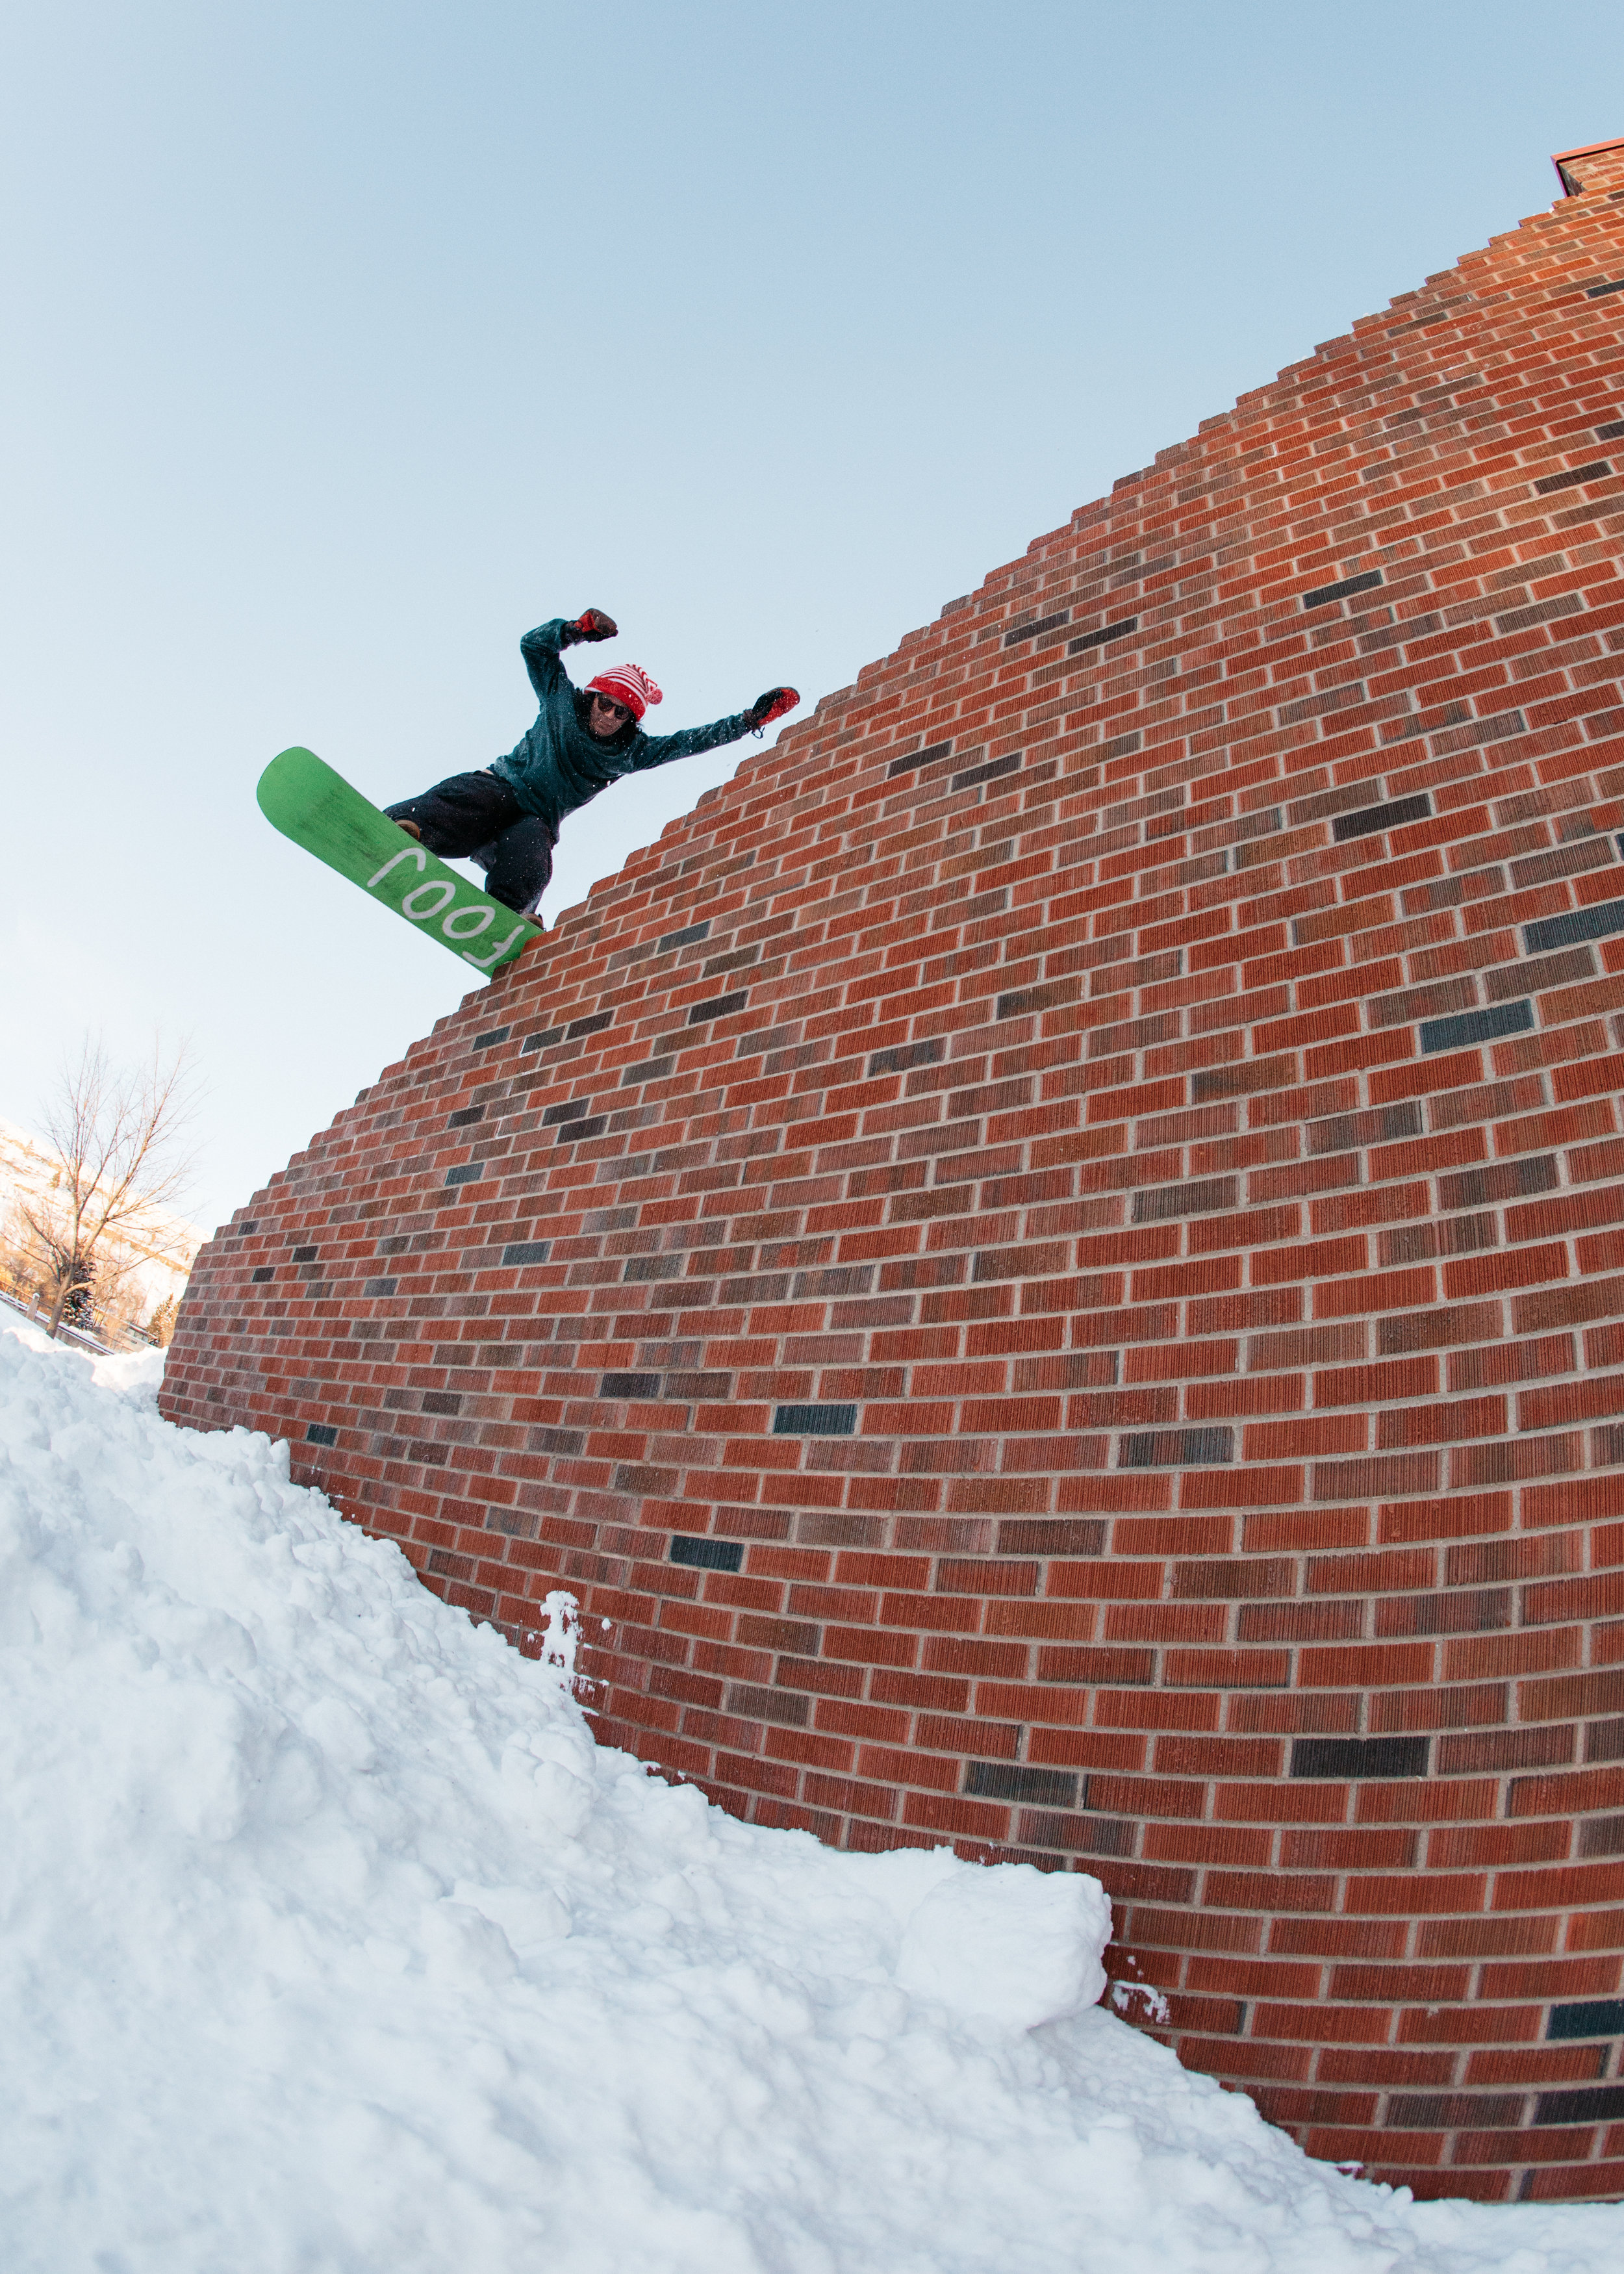 Chris_Fooj_FS_boardslide_Brick_Ledge_Jordan_Morse_Photo-1726.jpg